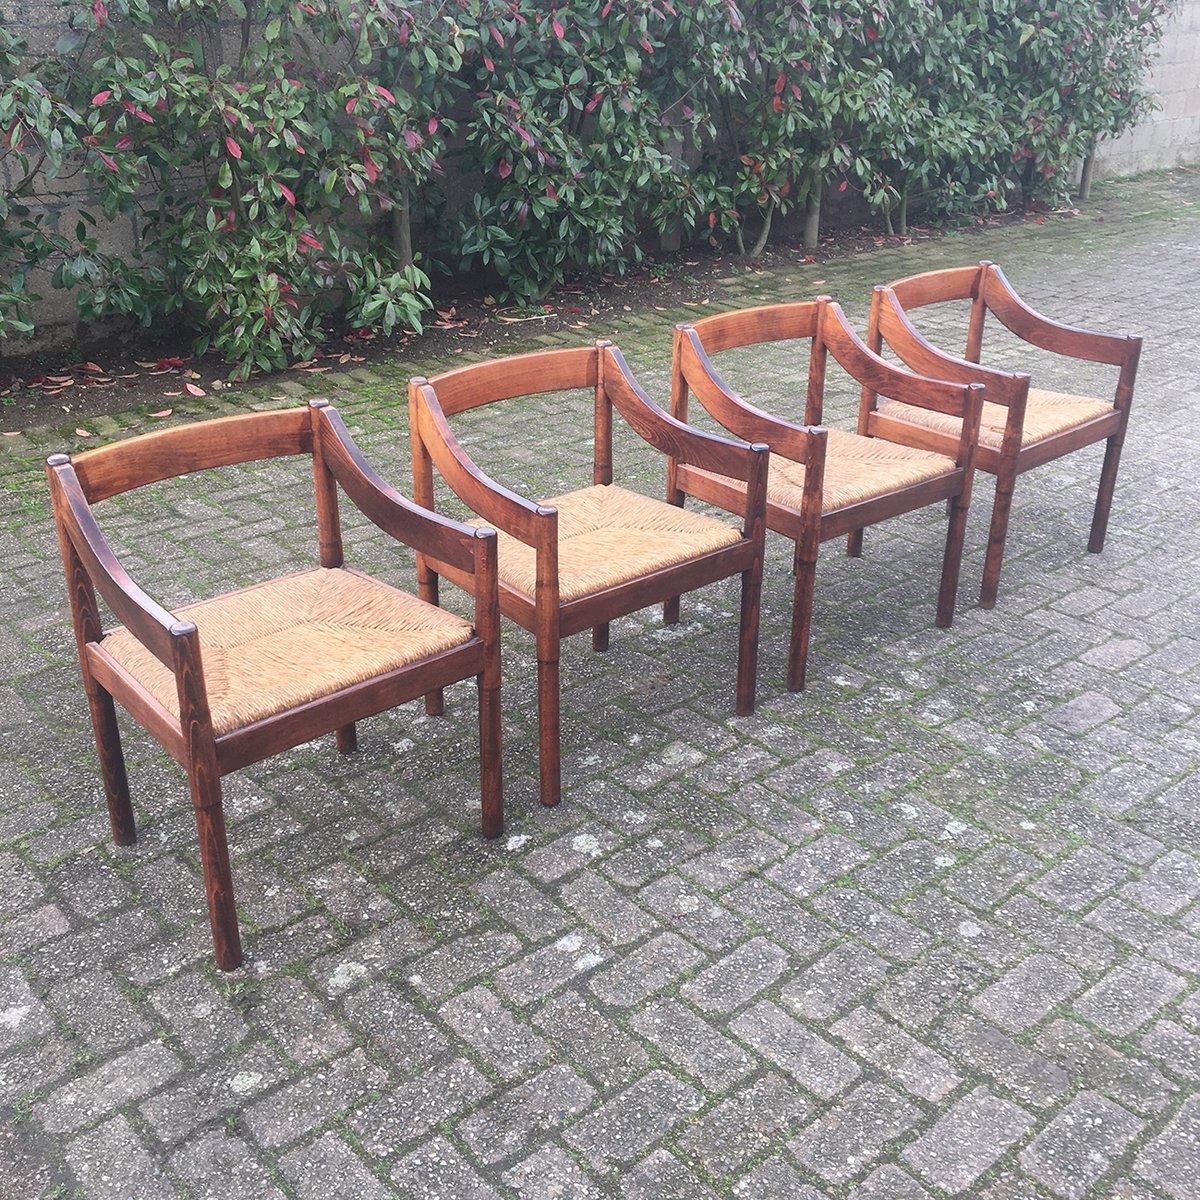 carimate esszimmer st hle von vico magistretti f r cassina 1960er 4er set bei pamono kaufen. Black Bedroom Furniture Sets. Home Design Ideas